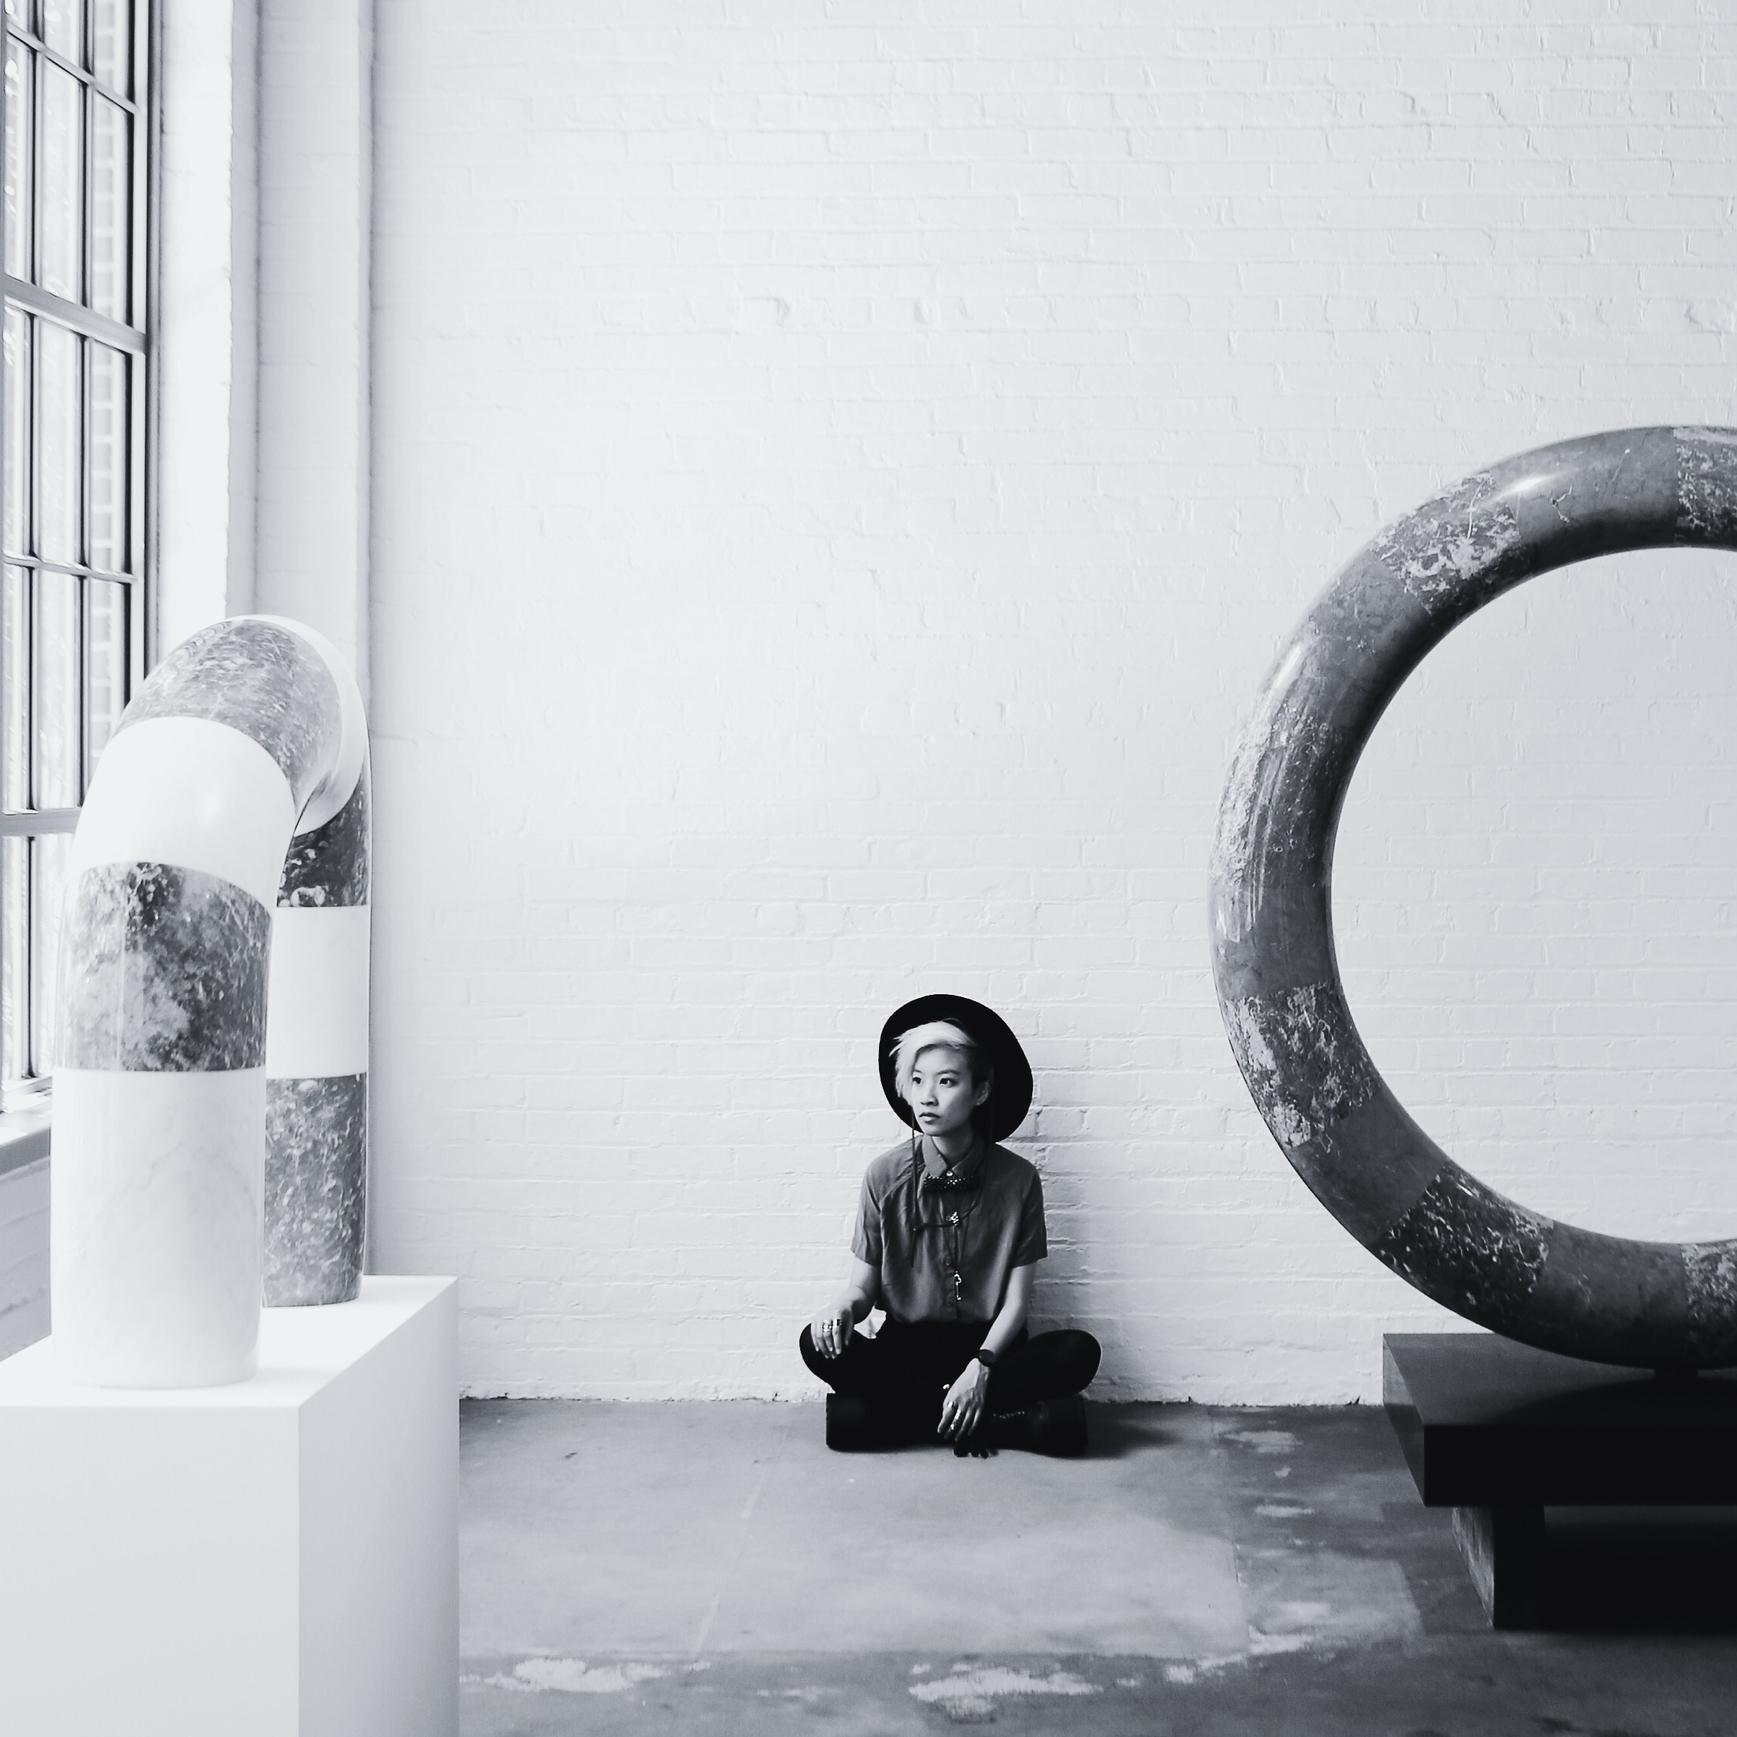 NOGUCHI MUSEUM | TRAVEL  June 2015